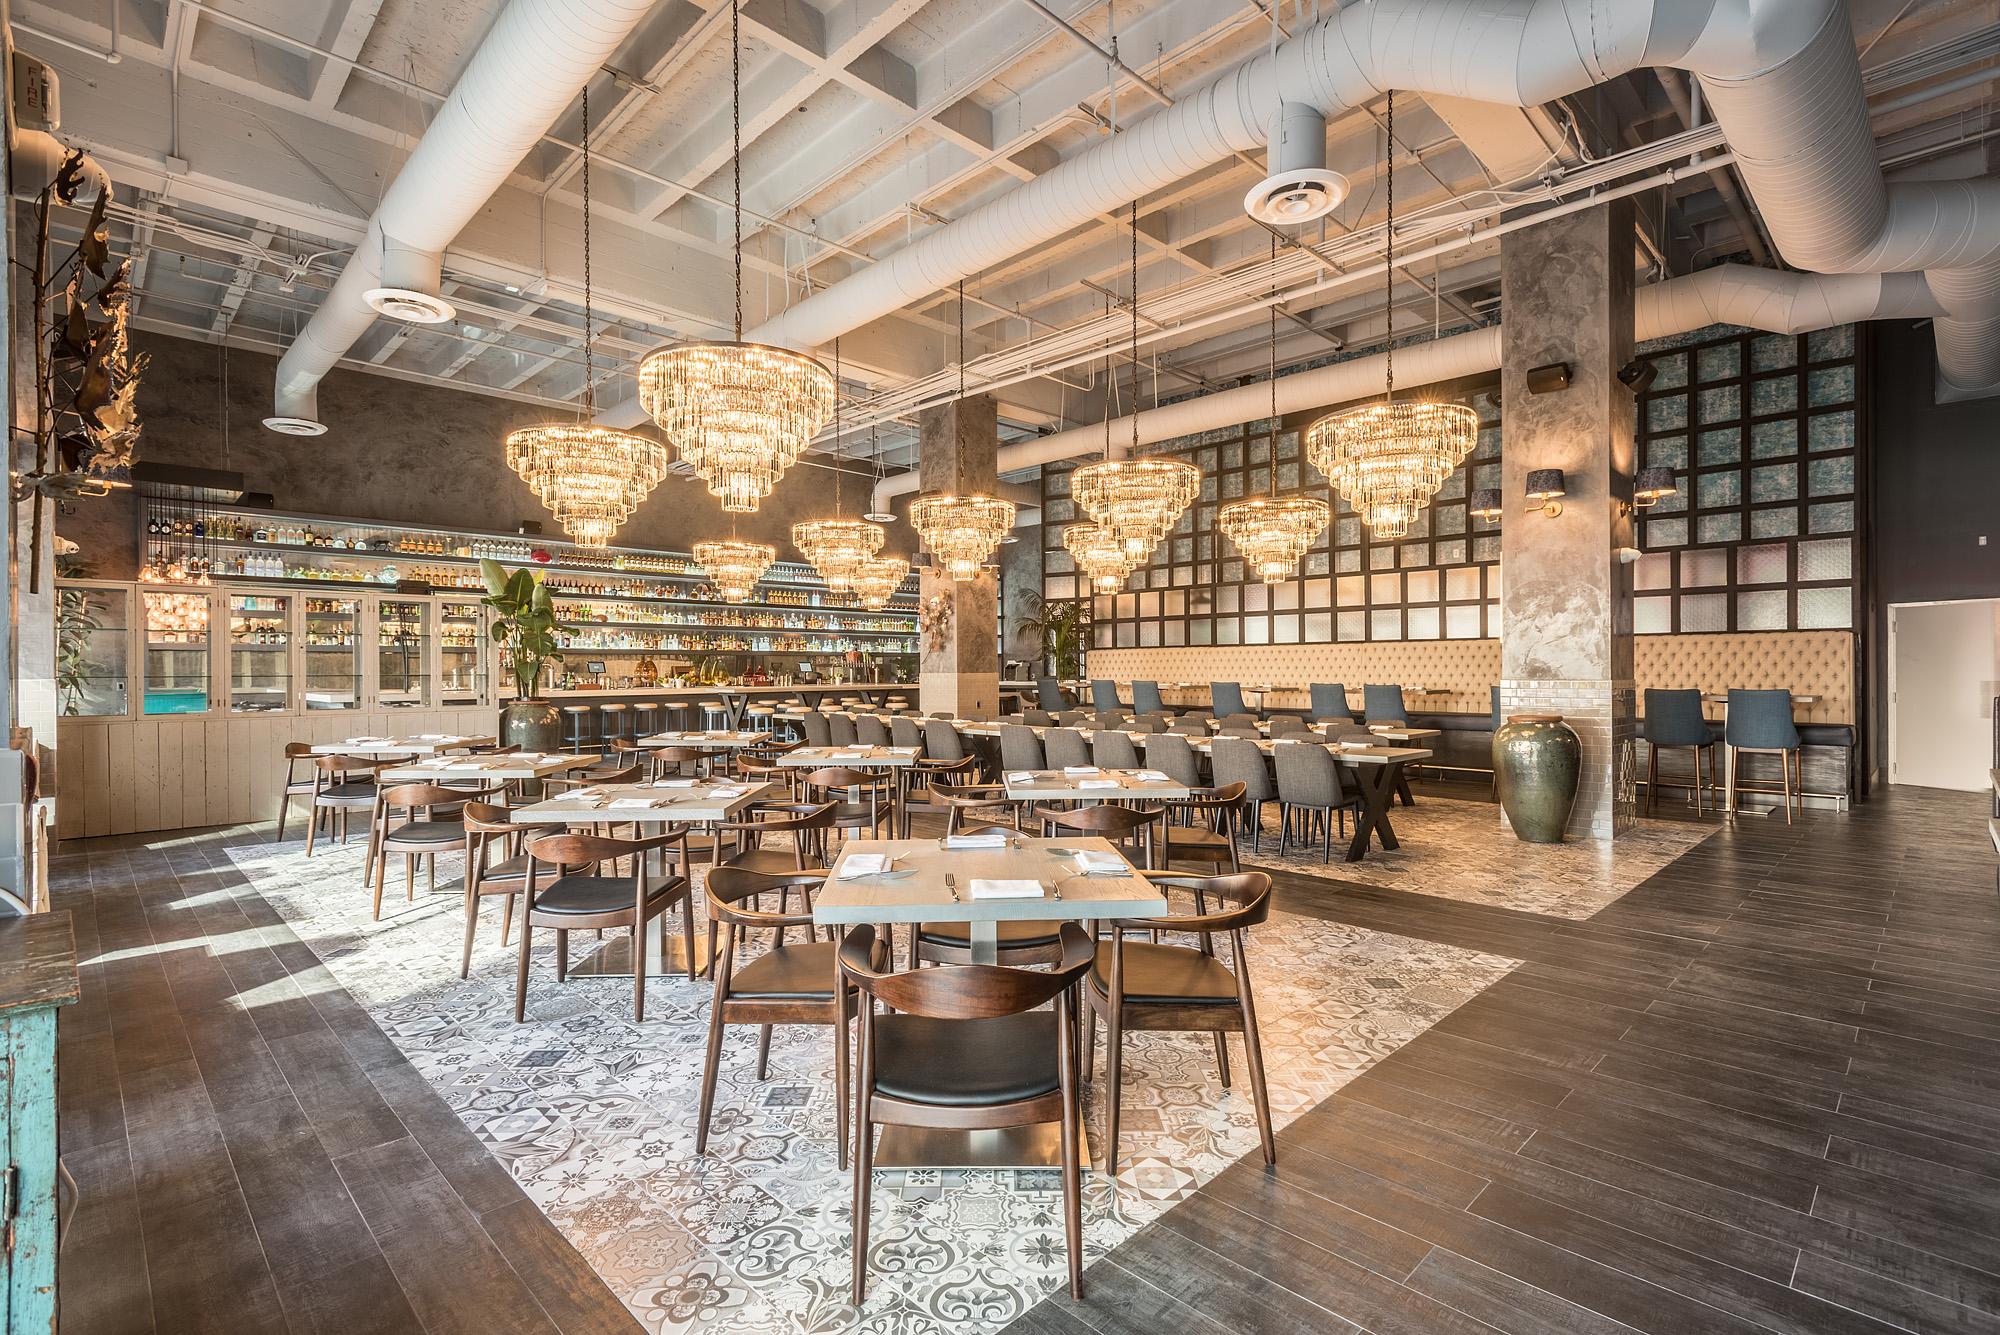 Hereu0027s The Opening Menu For Terra Cotta, Koreatownu0027s Striking New Restaurant